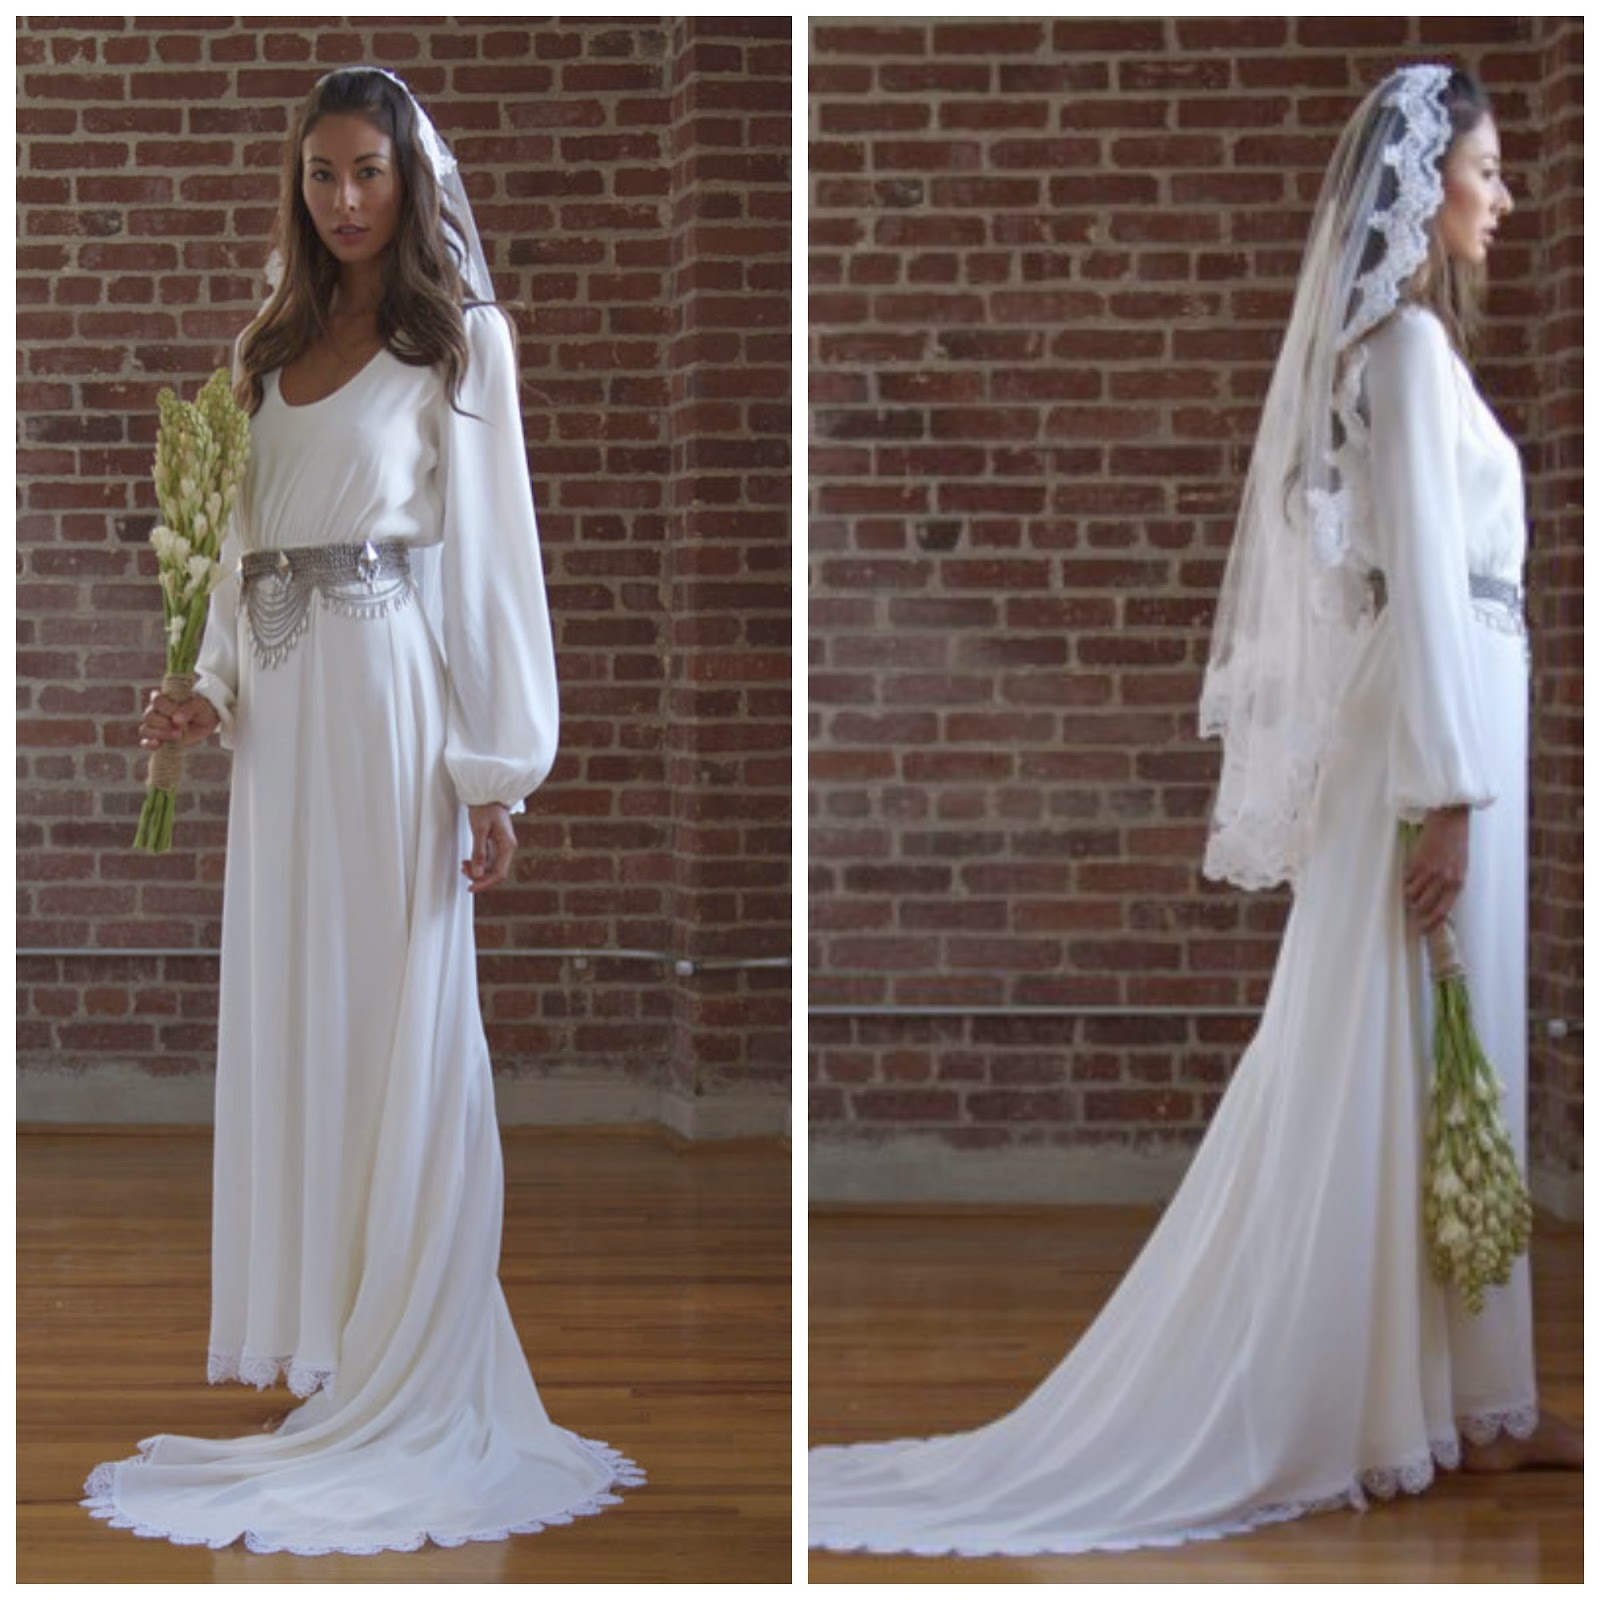 Enchanting Stone Cold Fox Bridesmaid Dresses Motif - Wedding Plan ...